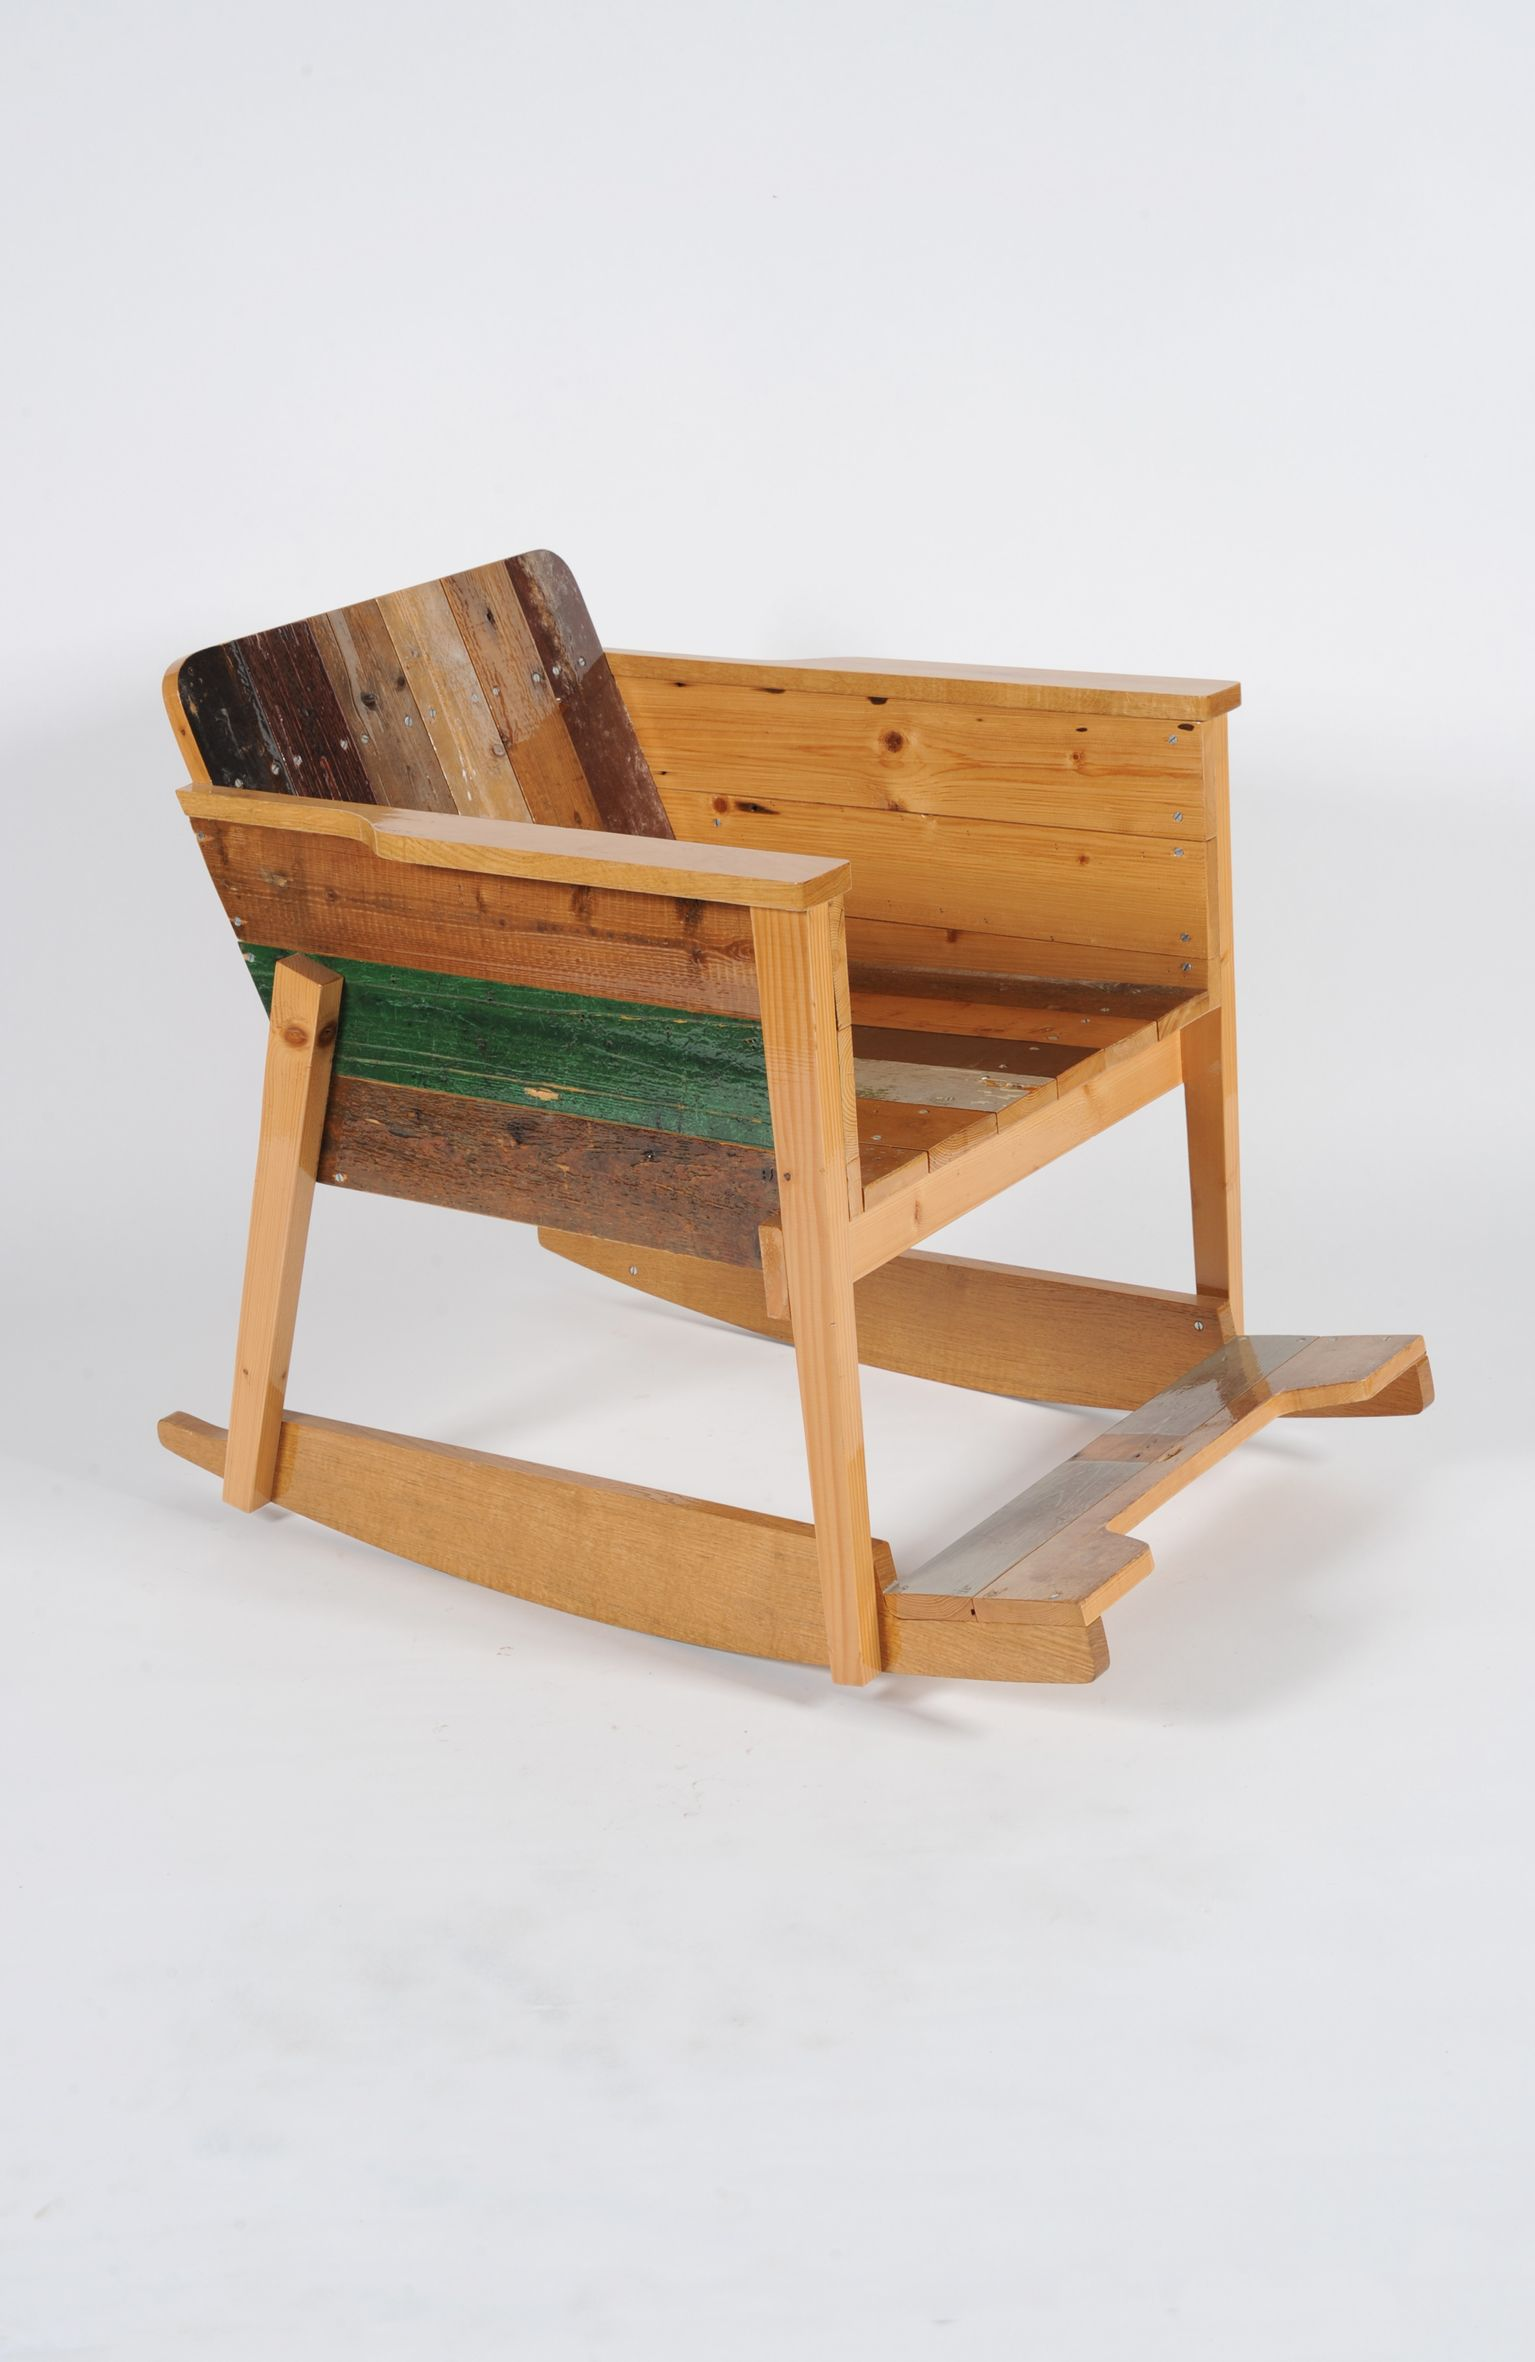 Superieur Scrap Wood Rocking Chair / Año: 2002 / Vendidas: 69 Desde 2007